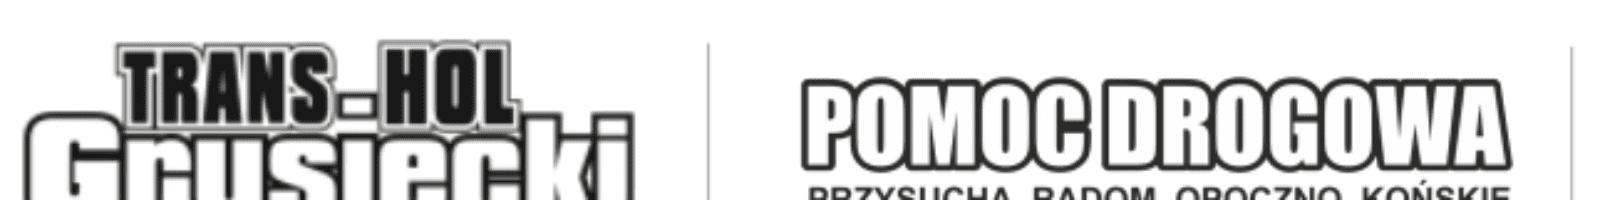 cropped logo4